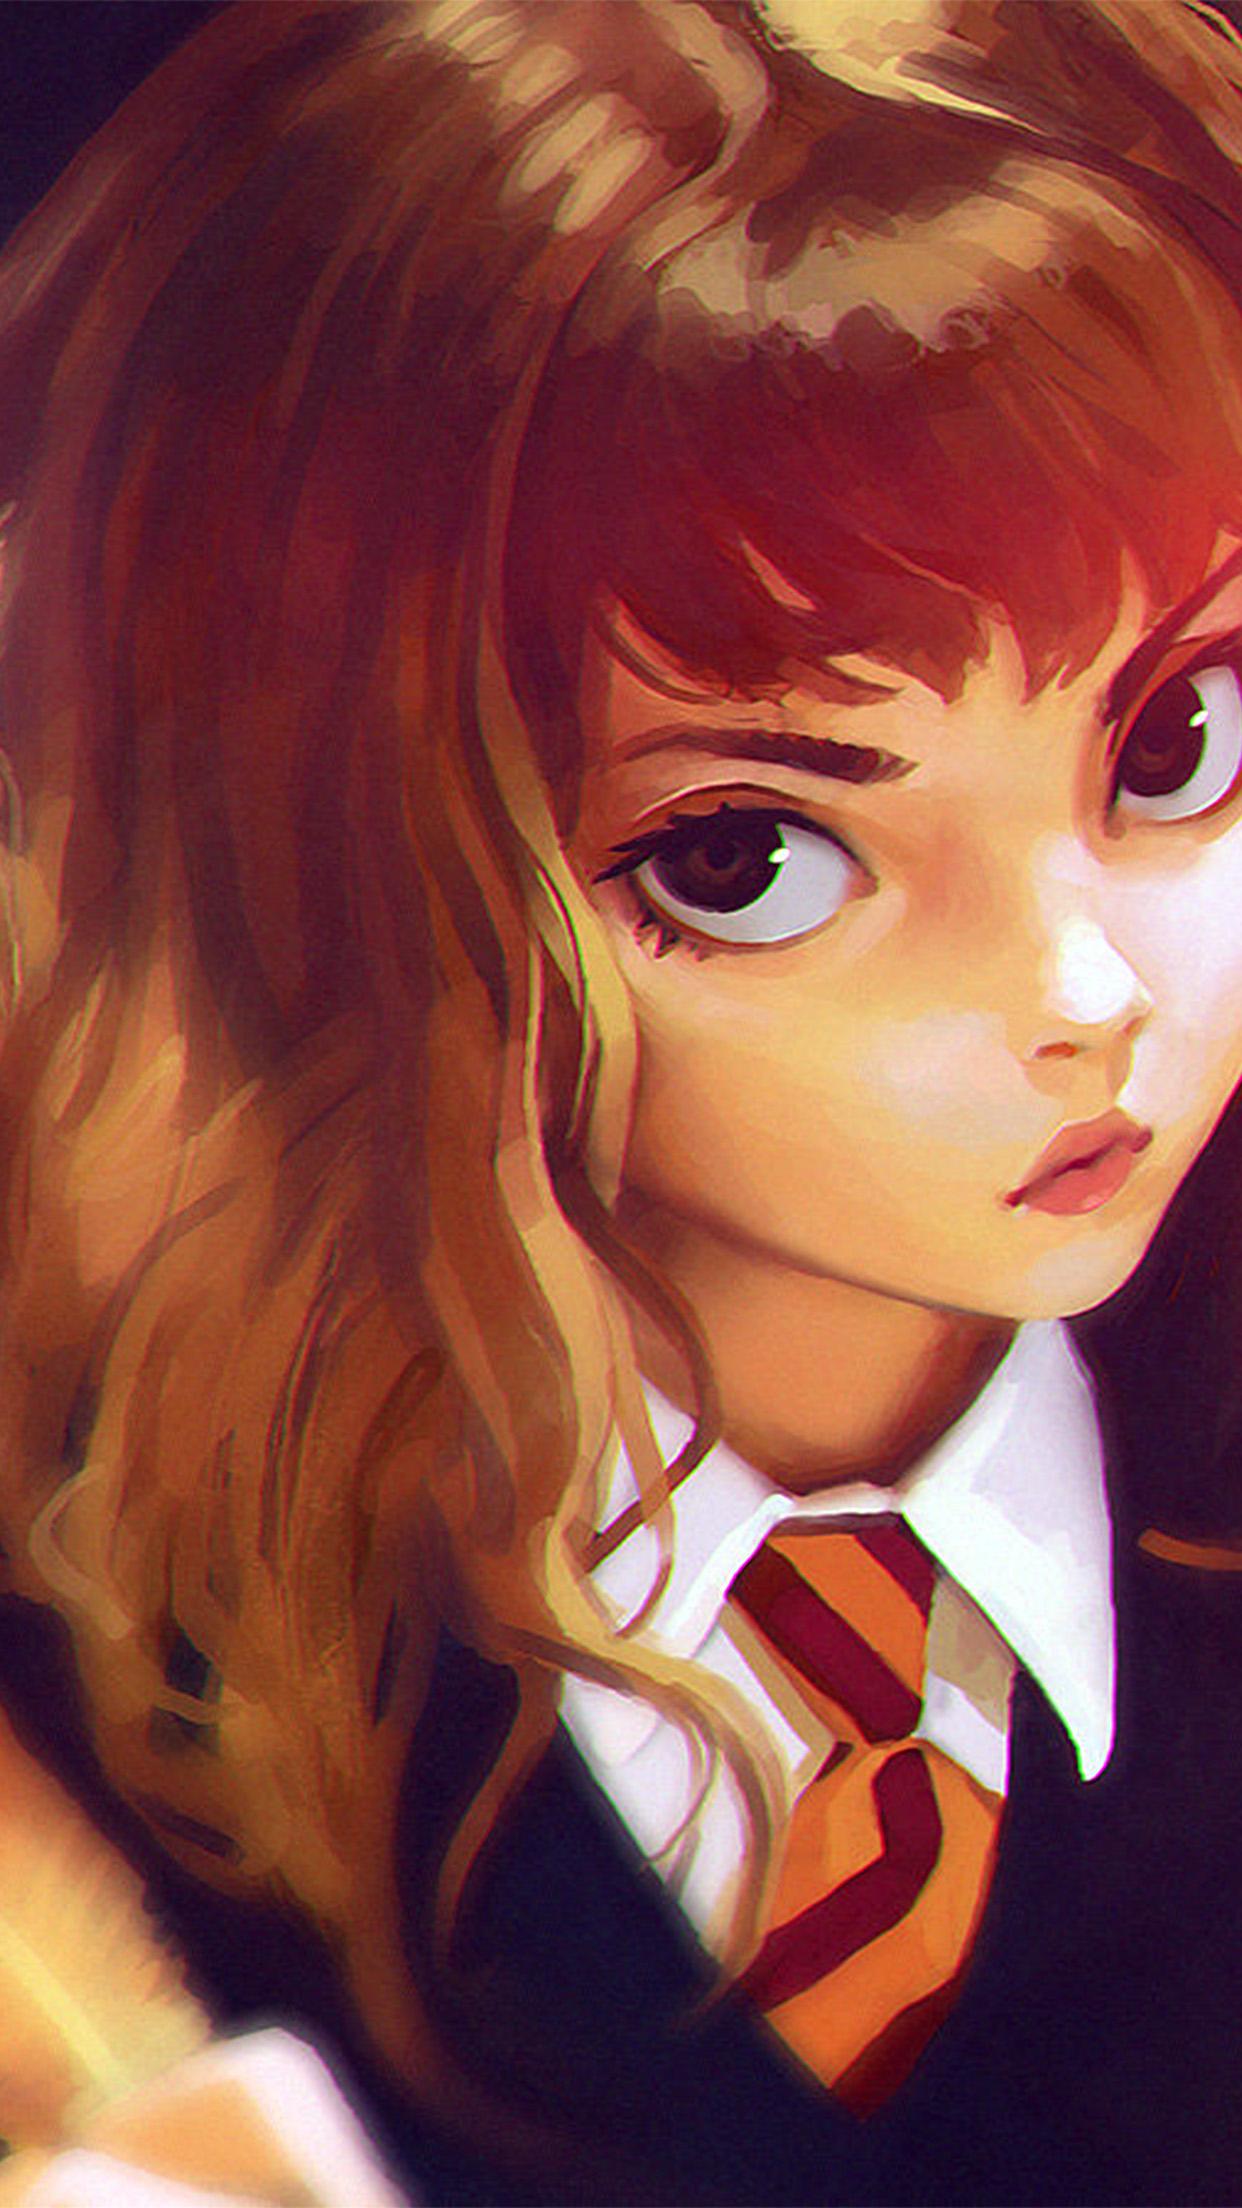 Bd66 Hermione Harry Potter Liya Art Illustration Flare Wallpaper